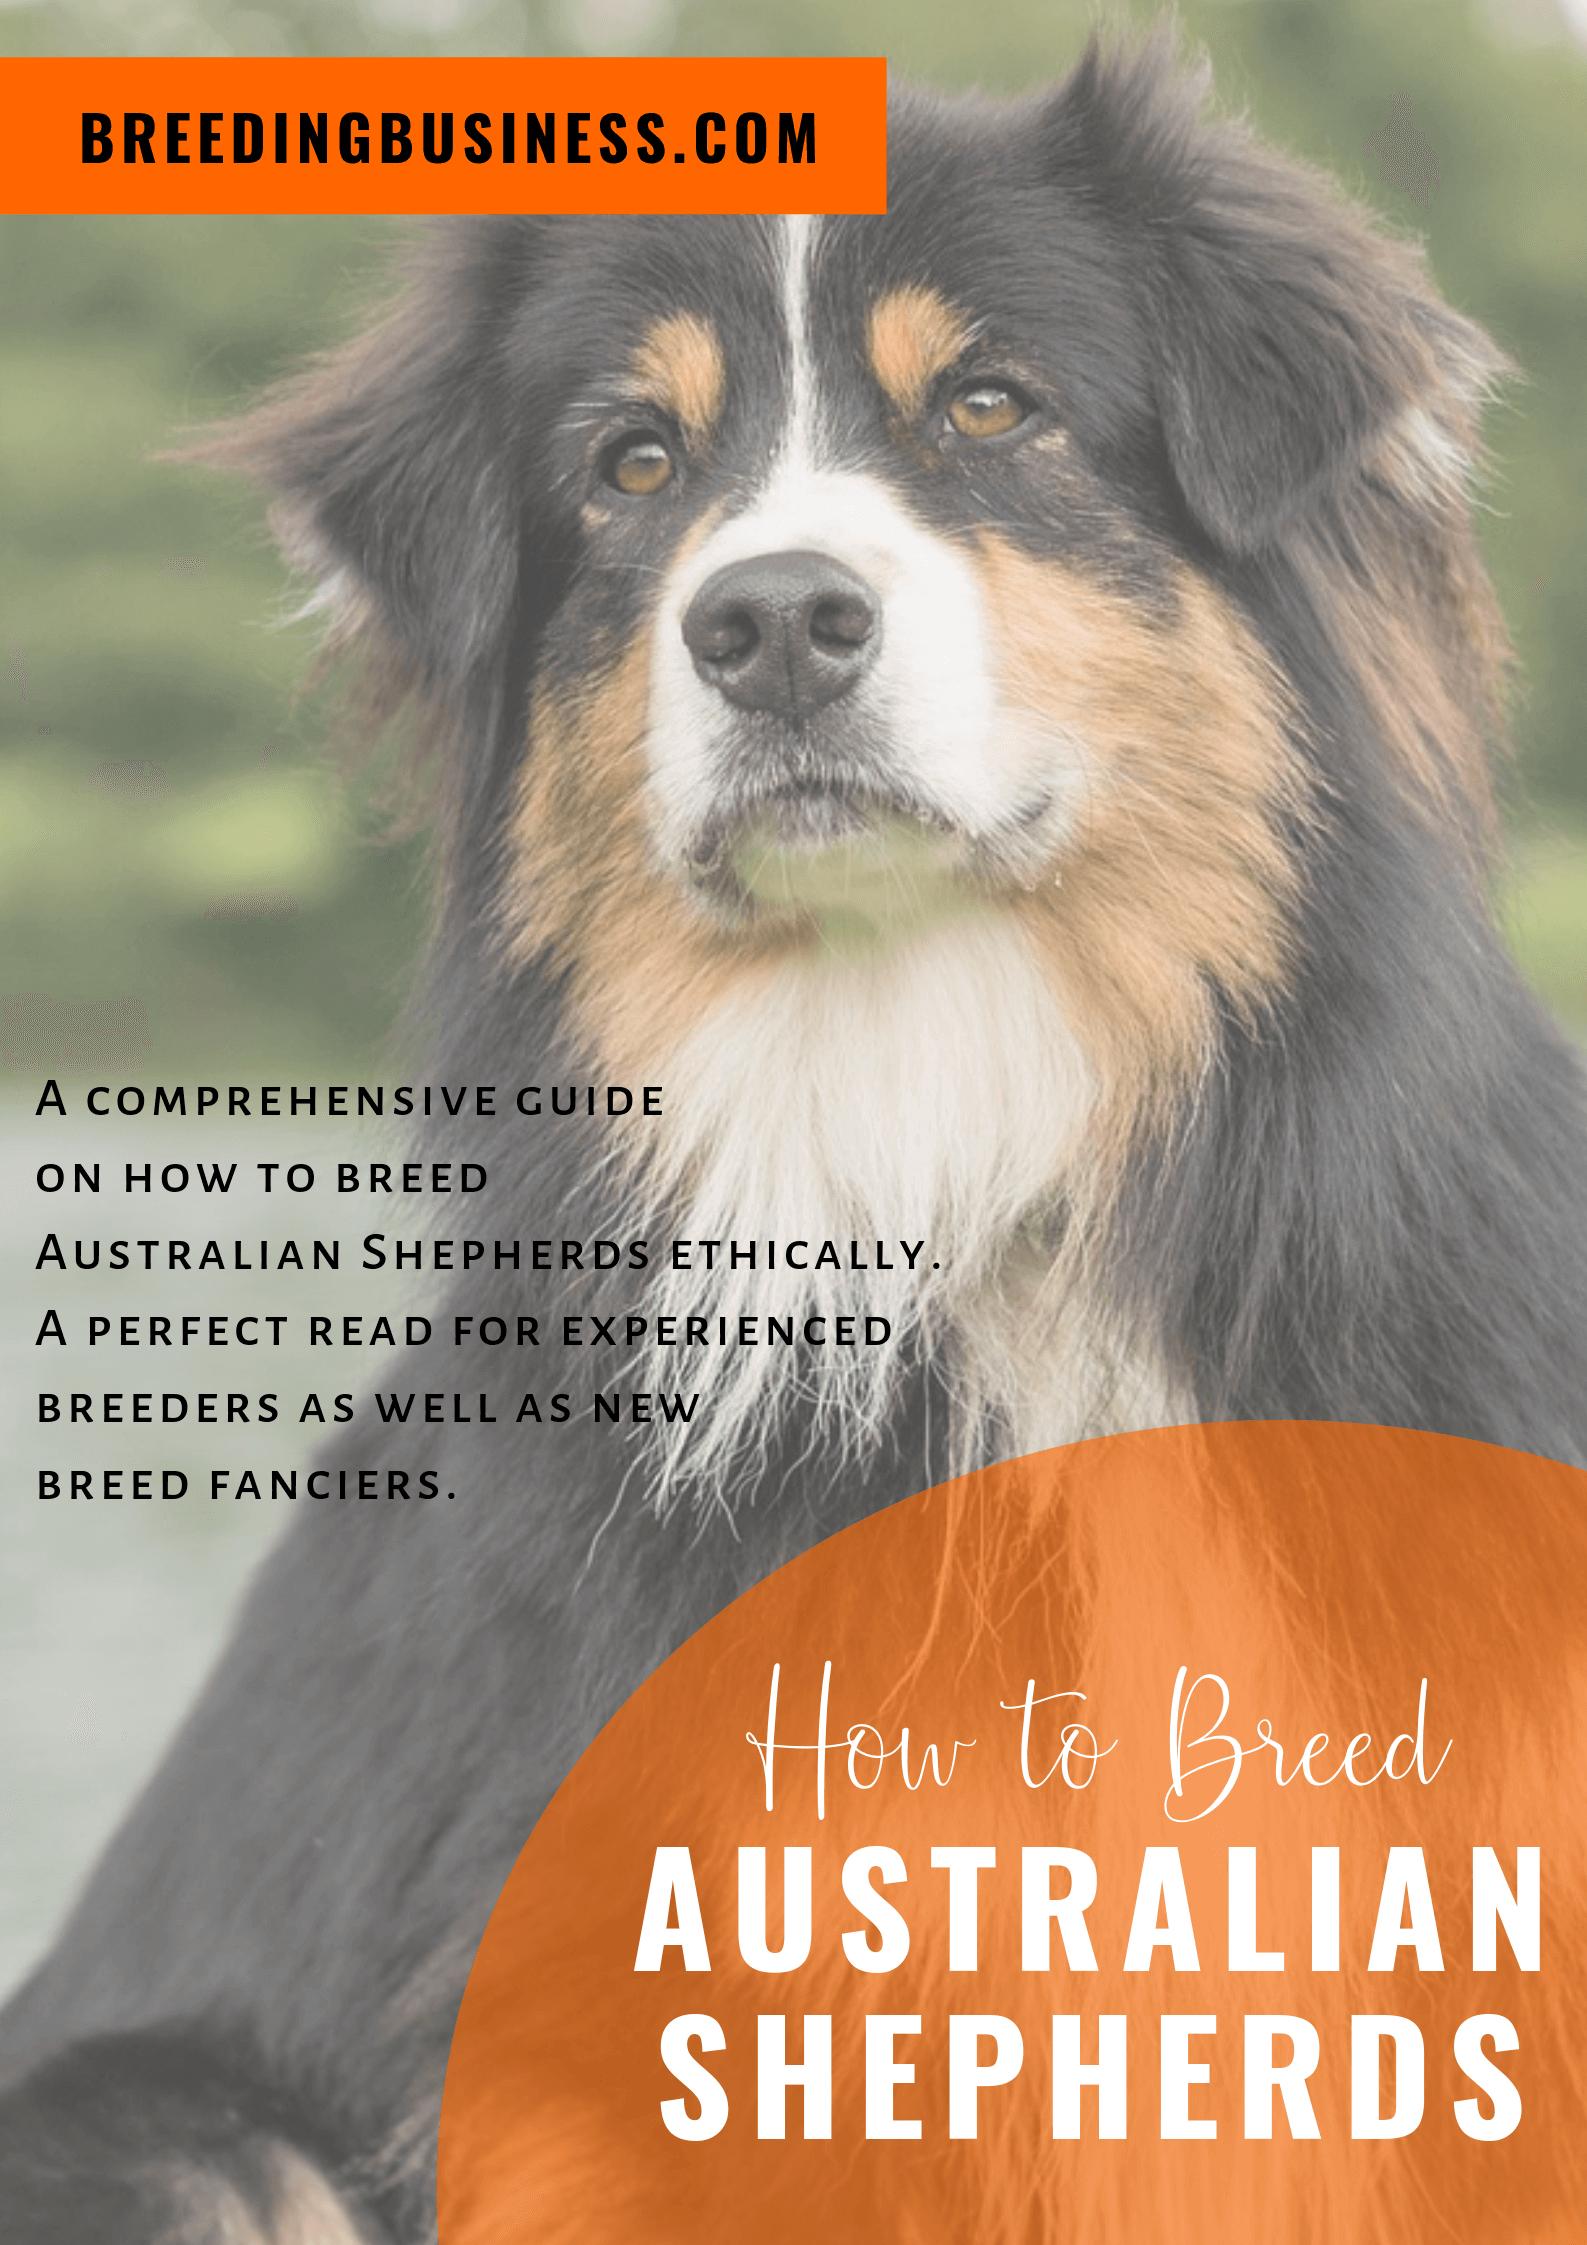 breeding Australian Shepherds